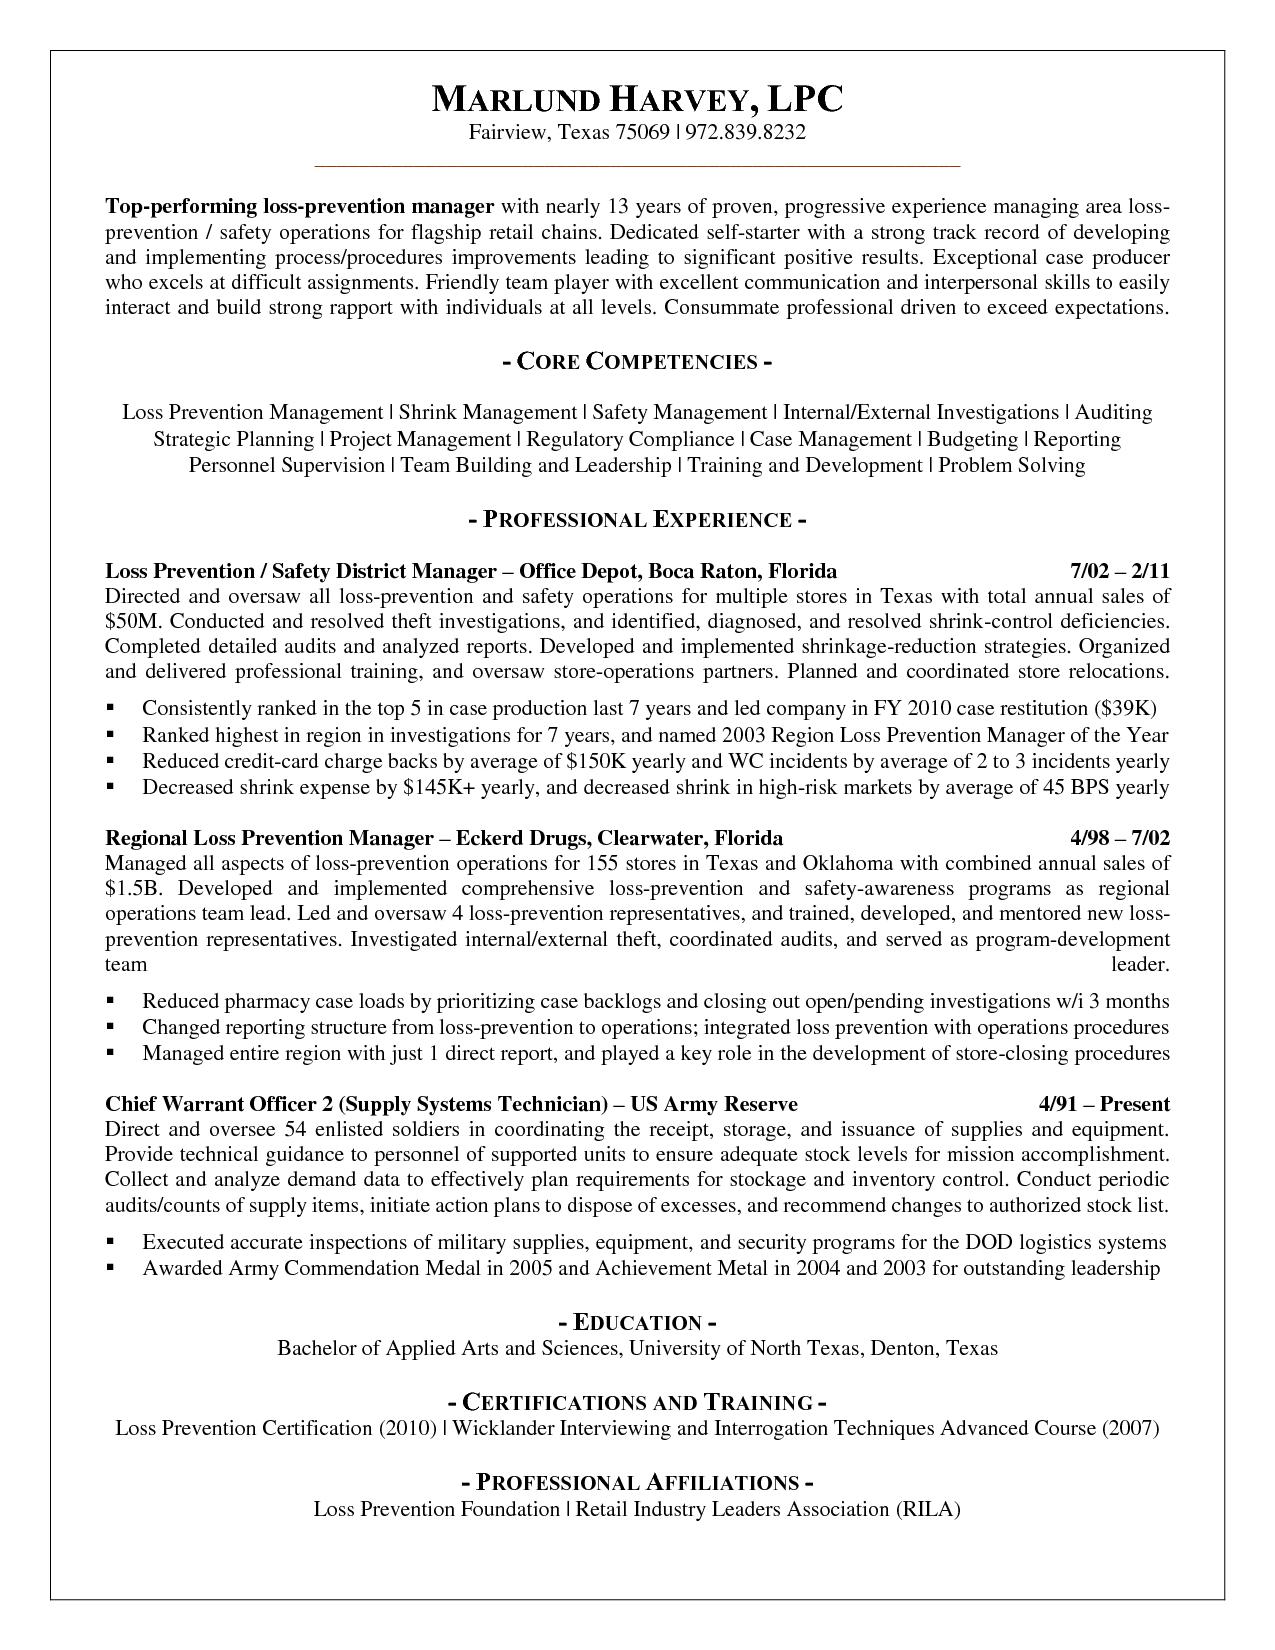 Scope Of Work Template Job Resume Template Resume Sample Resume